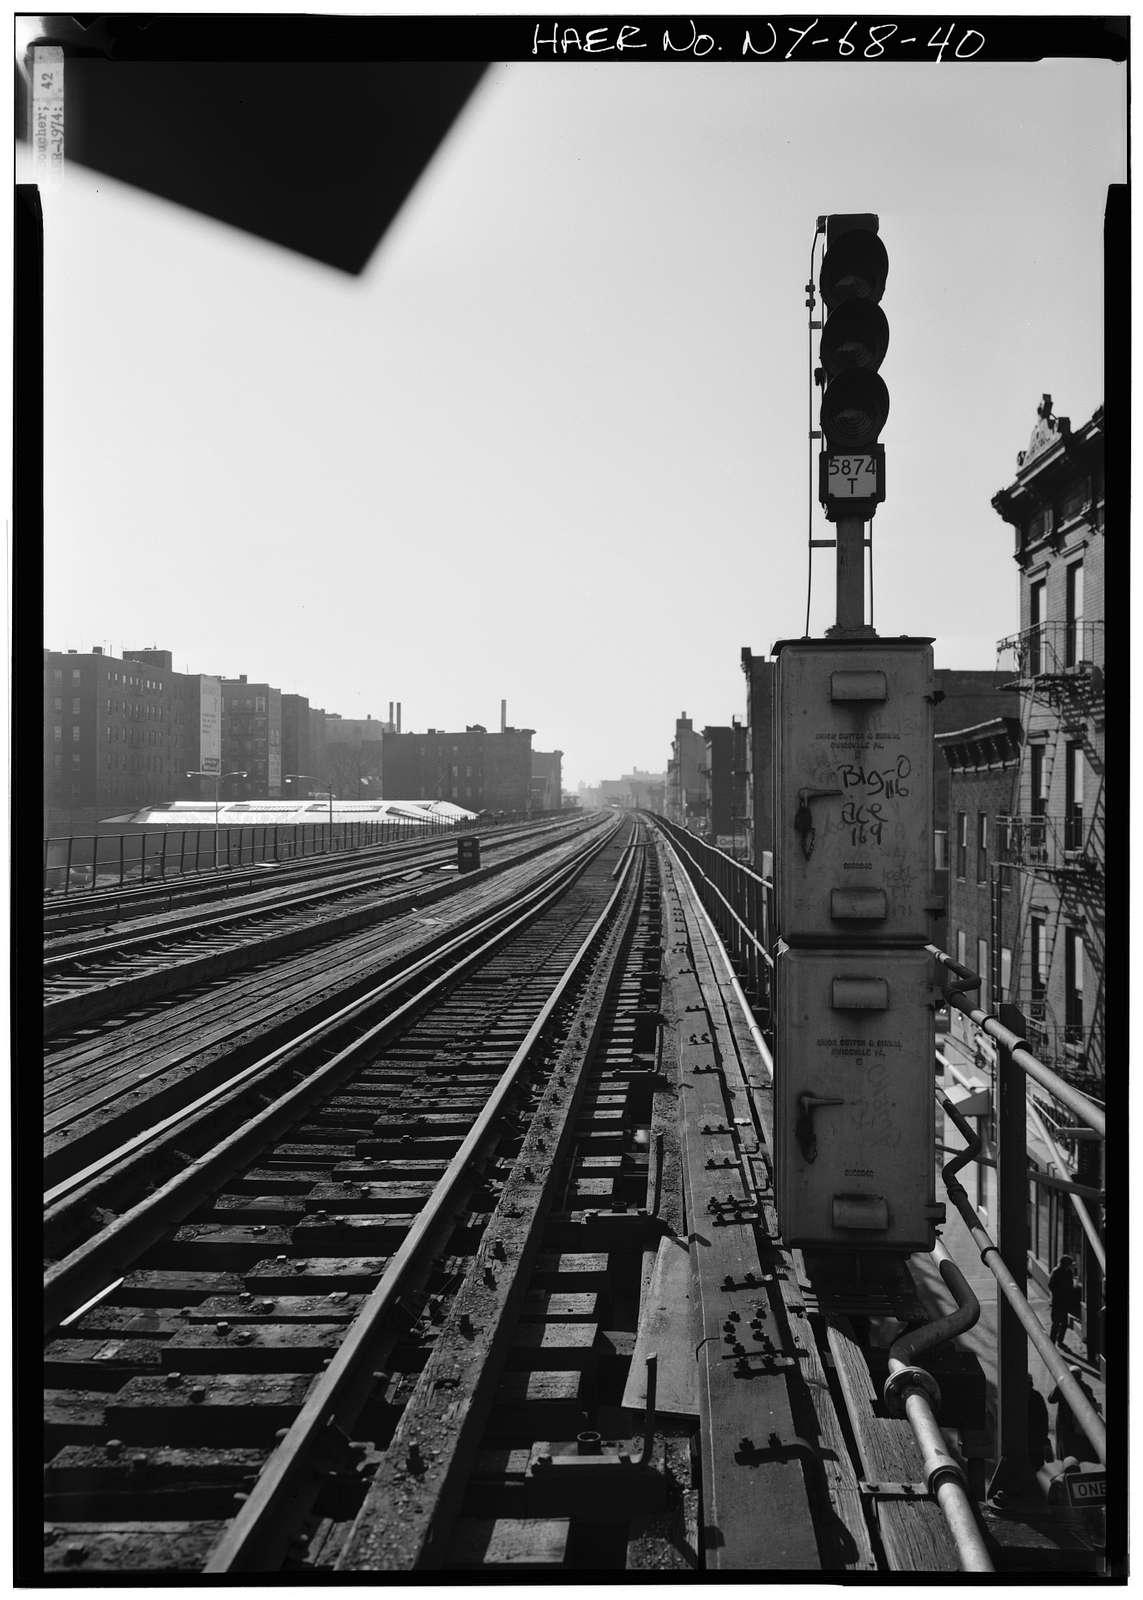 Interborough Rapid Transit Company, Third Avenue Elevated Line, Borough of the Bronx, New York, New York County, NY